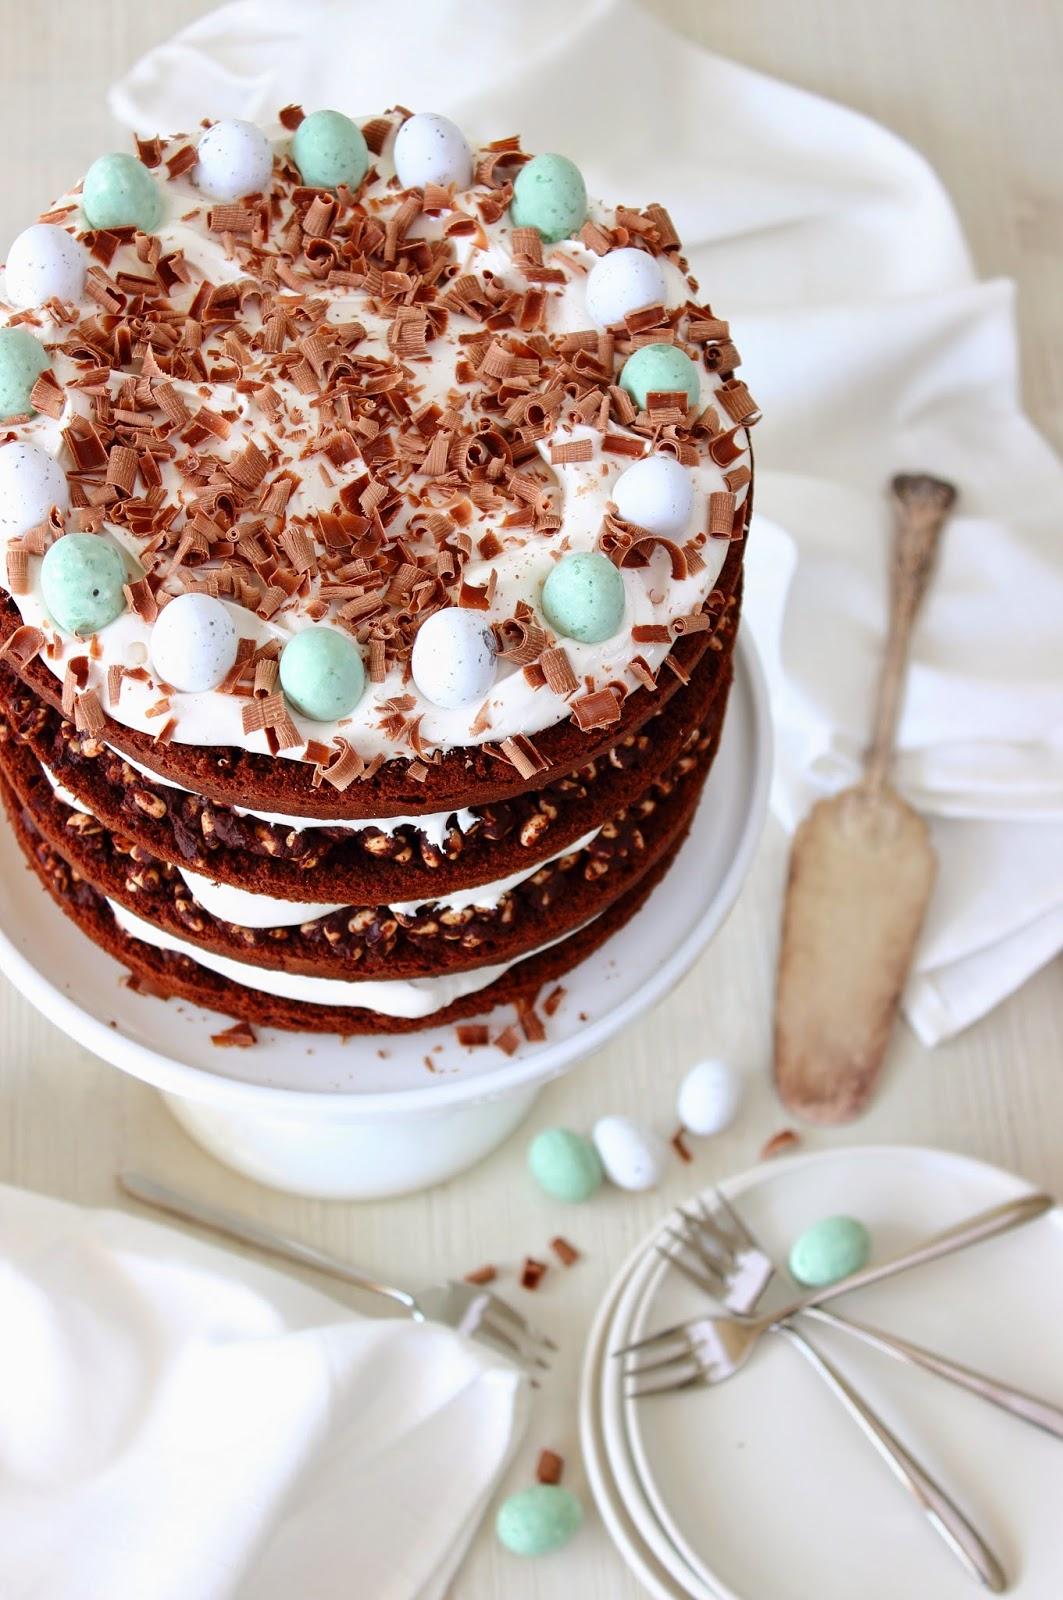 Chocolade-paastaart